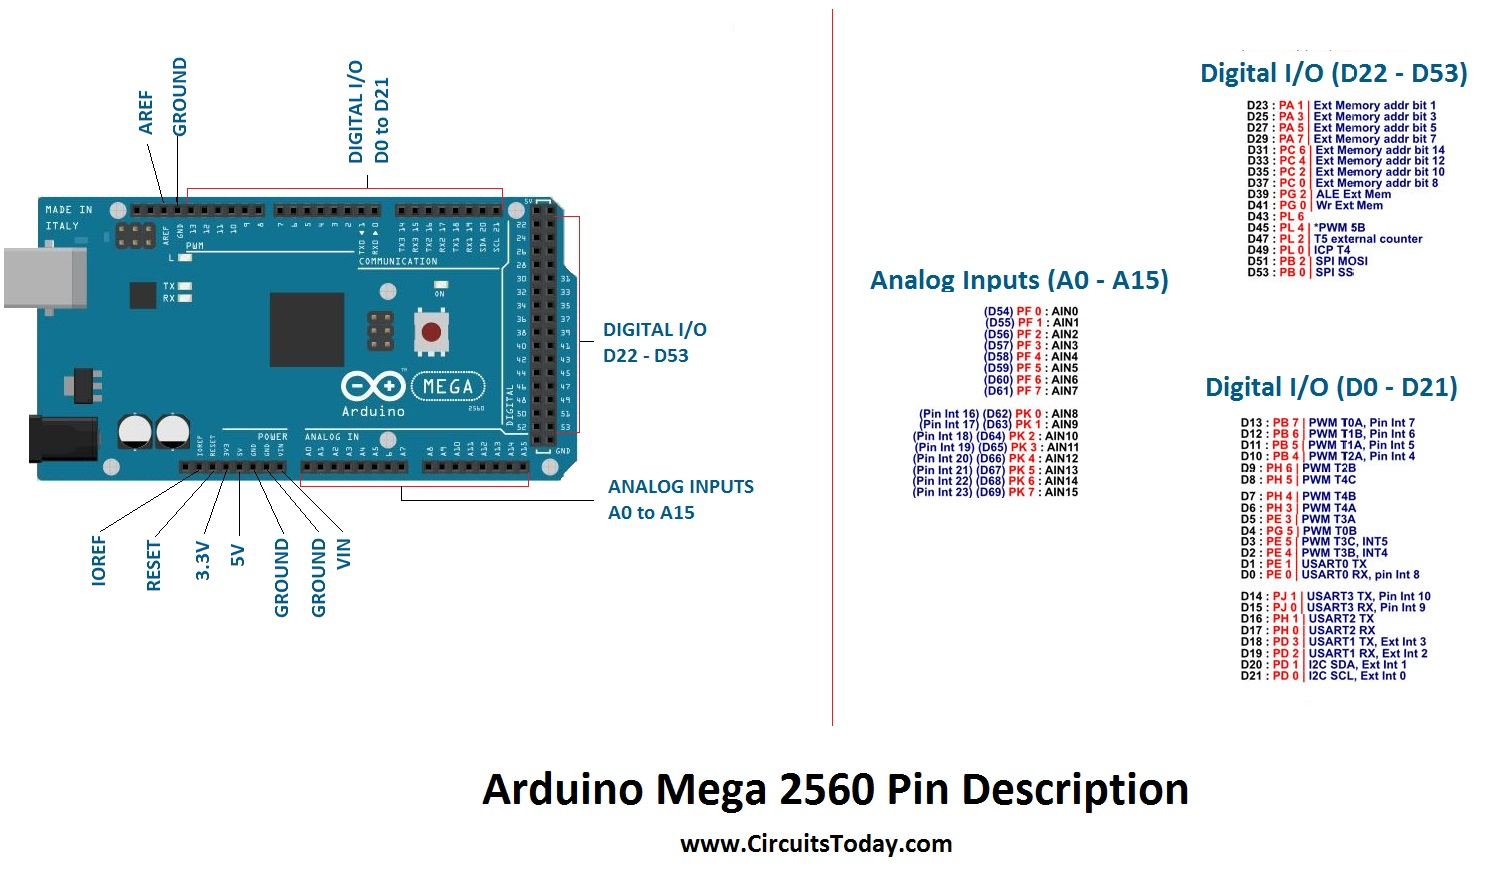 Enjoyable Arduino Mega Tutorial Pinout And Schematics Mega 2560 Specifications Wiring Cloud Mousmenurrecoveryedborg